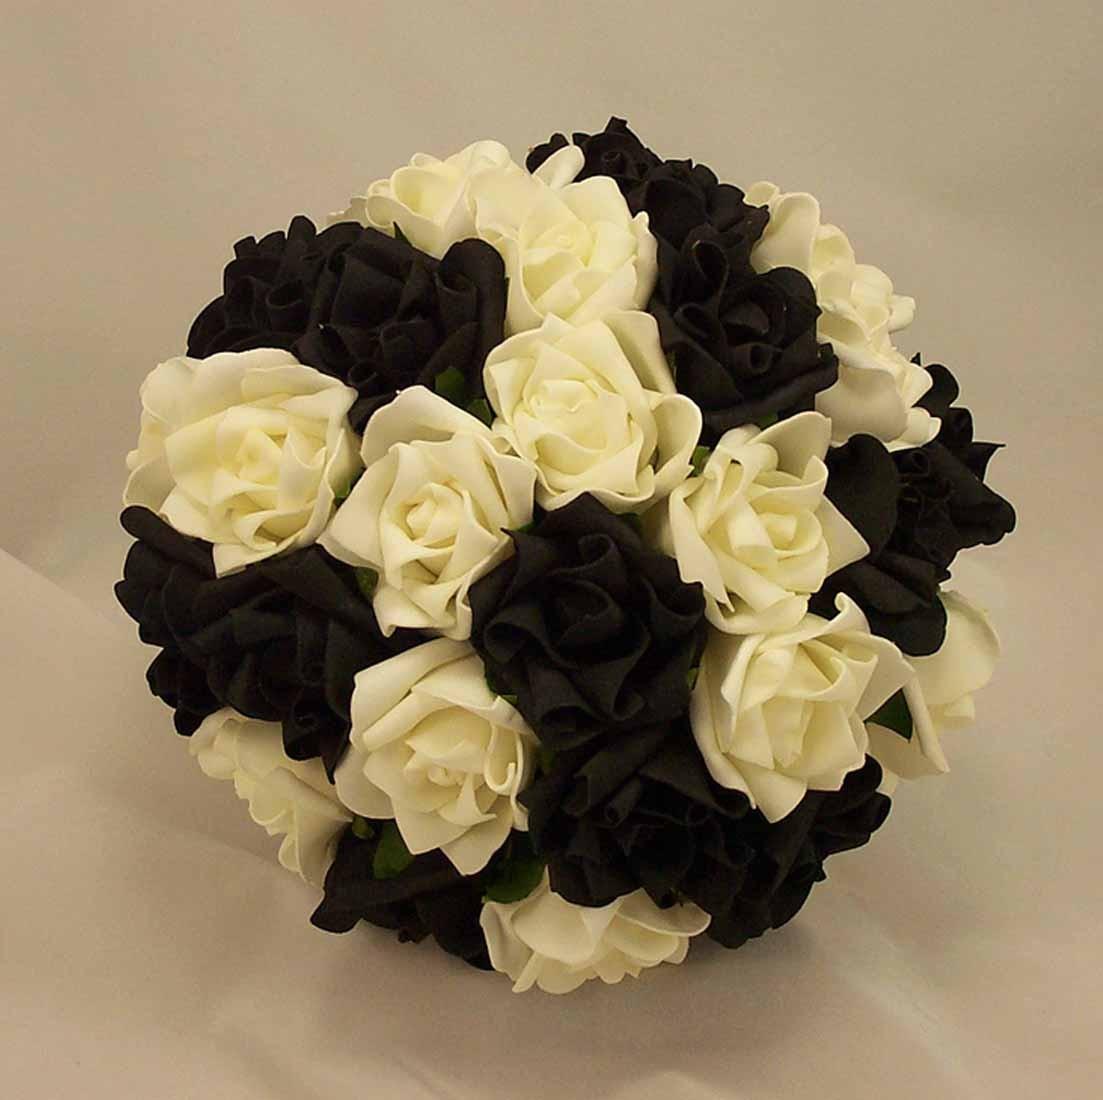 Black & White Rose Posy Bridal Bouquet